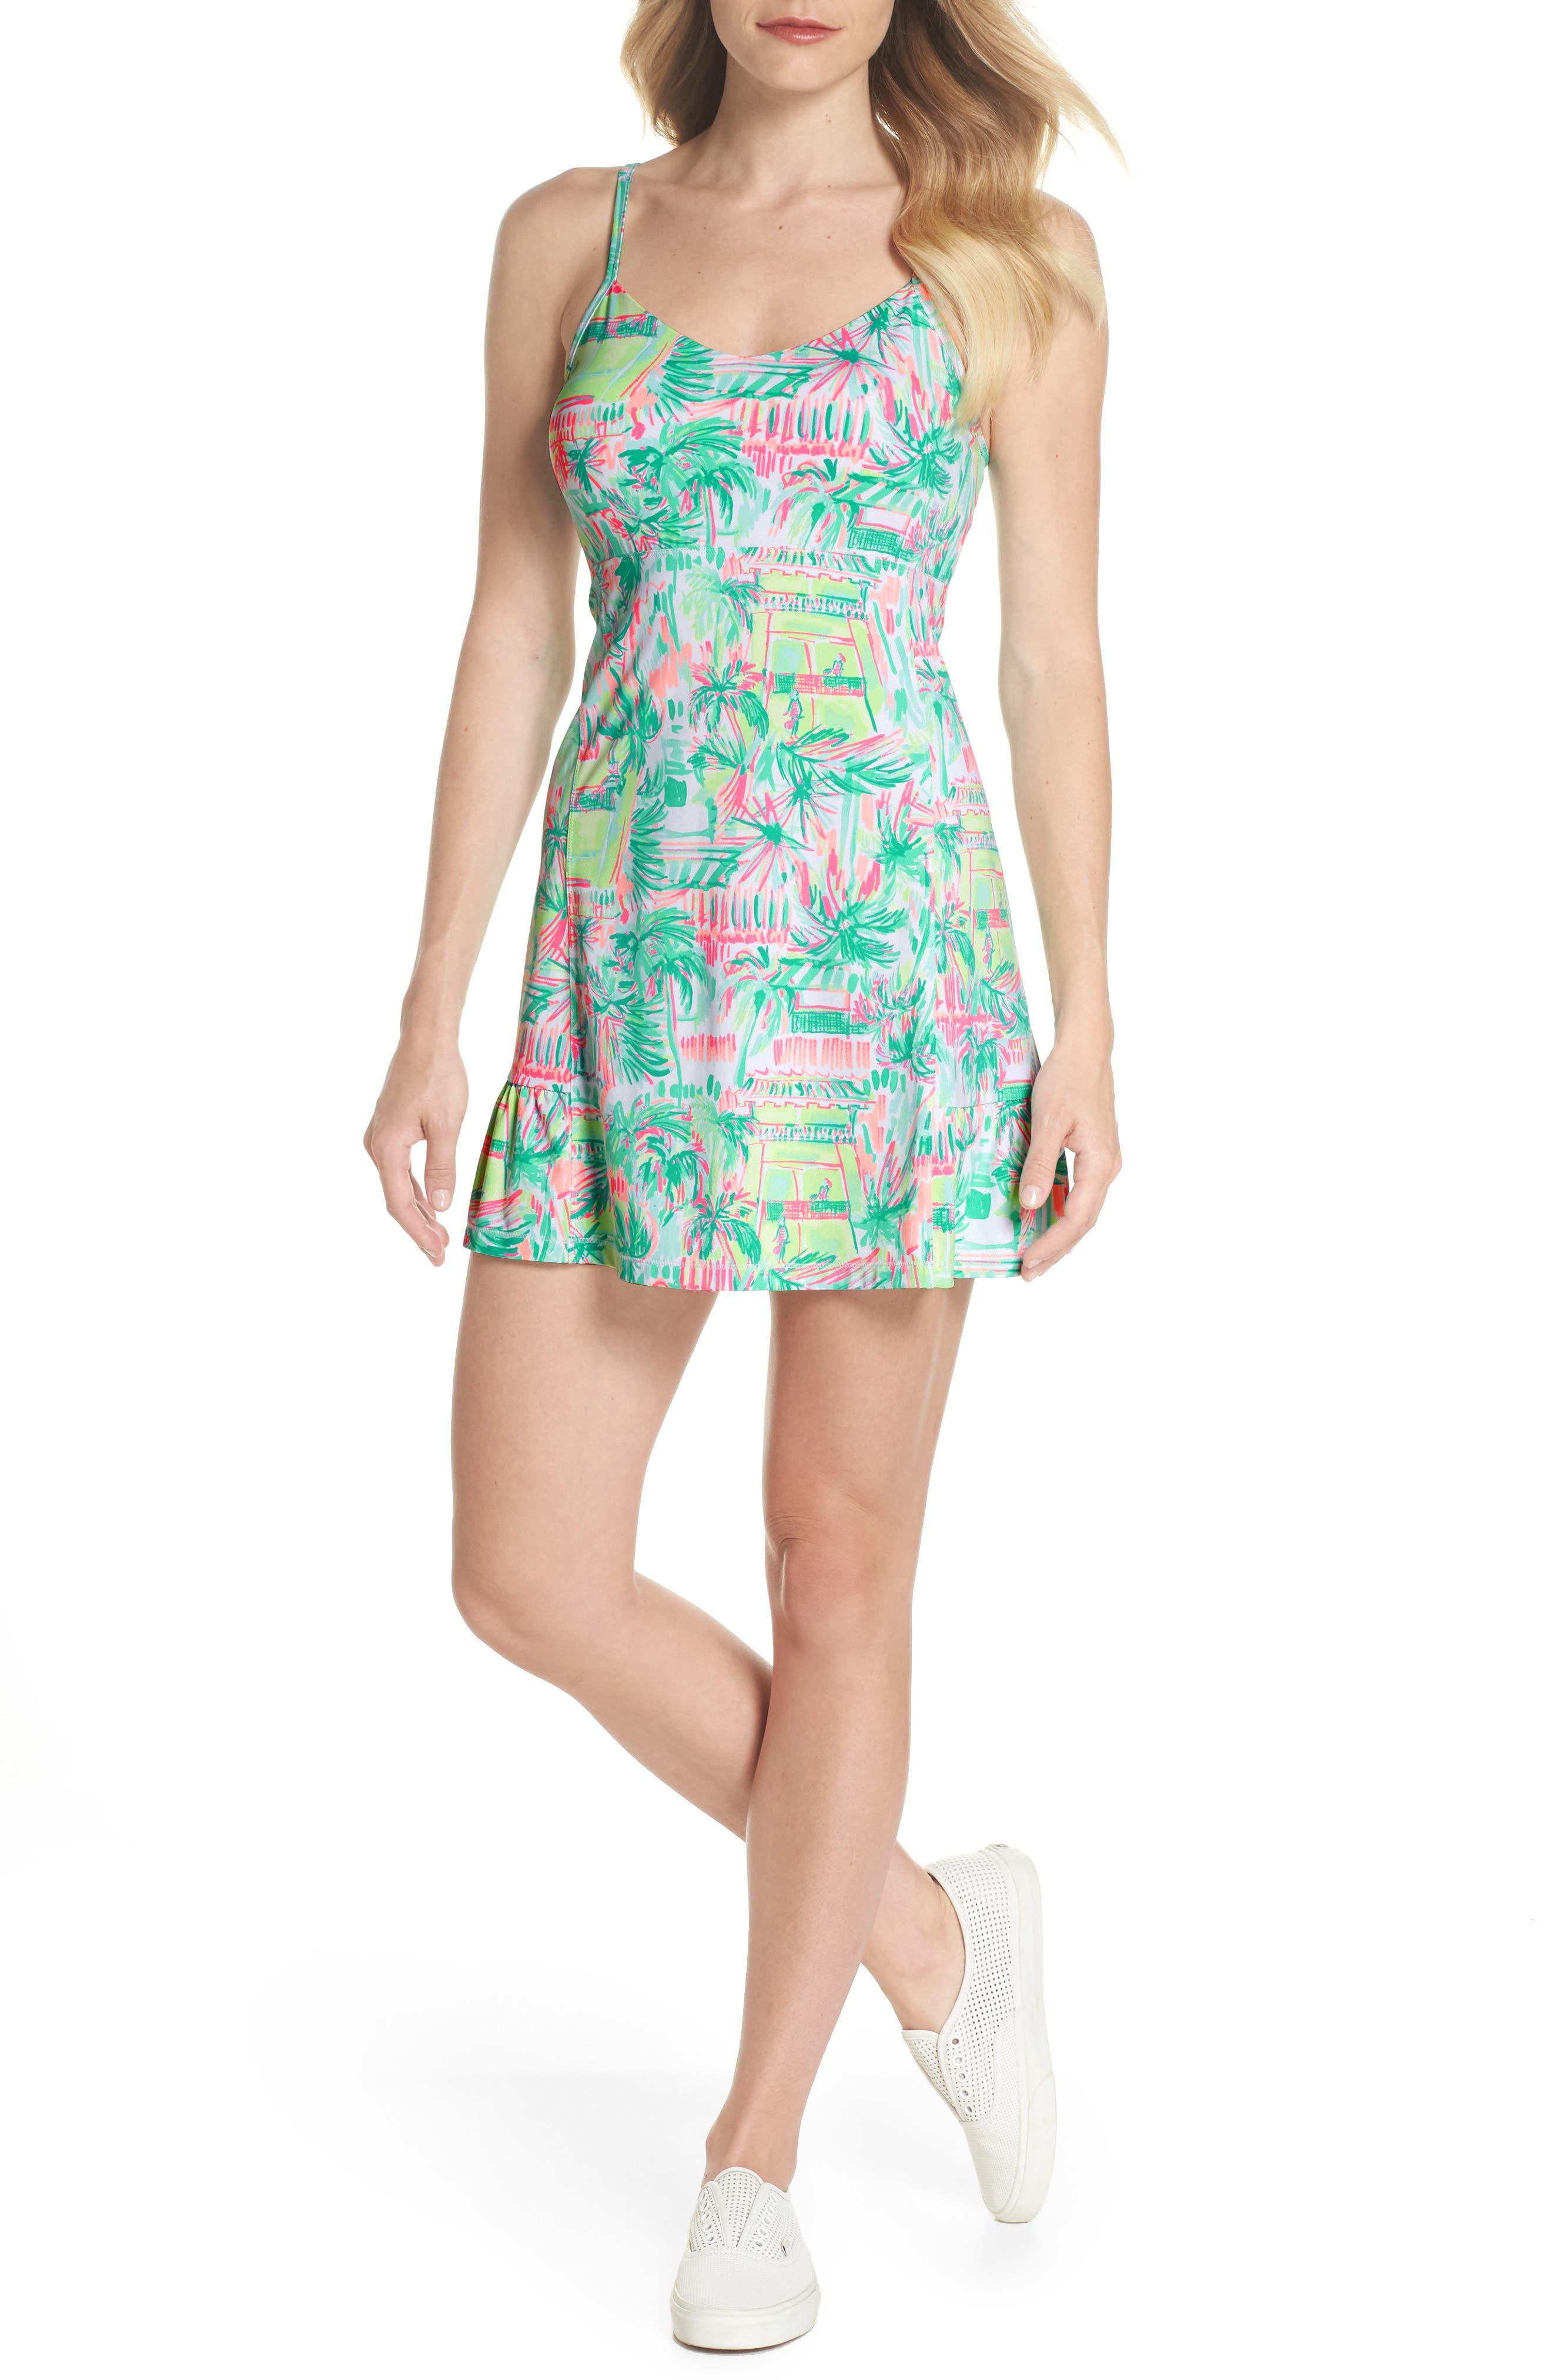 Lilly Pulitzer Adelia Upf 50+ Tennis Dress, Green